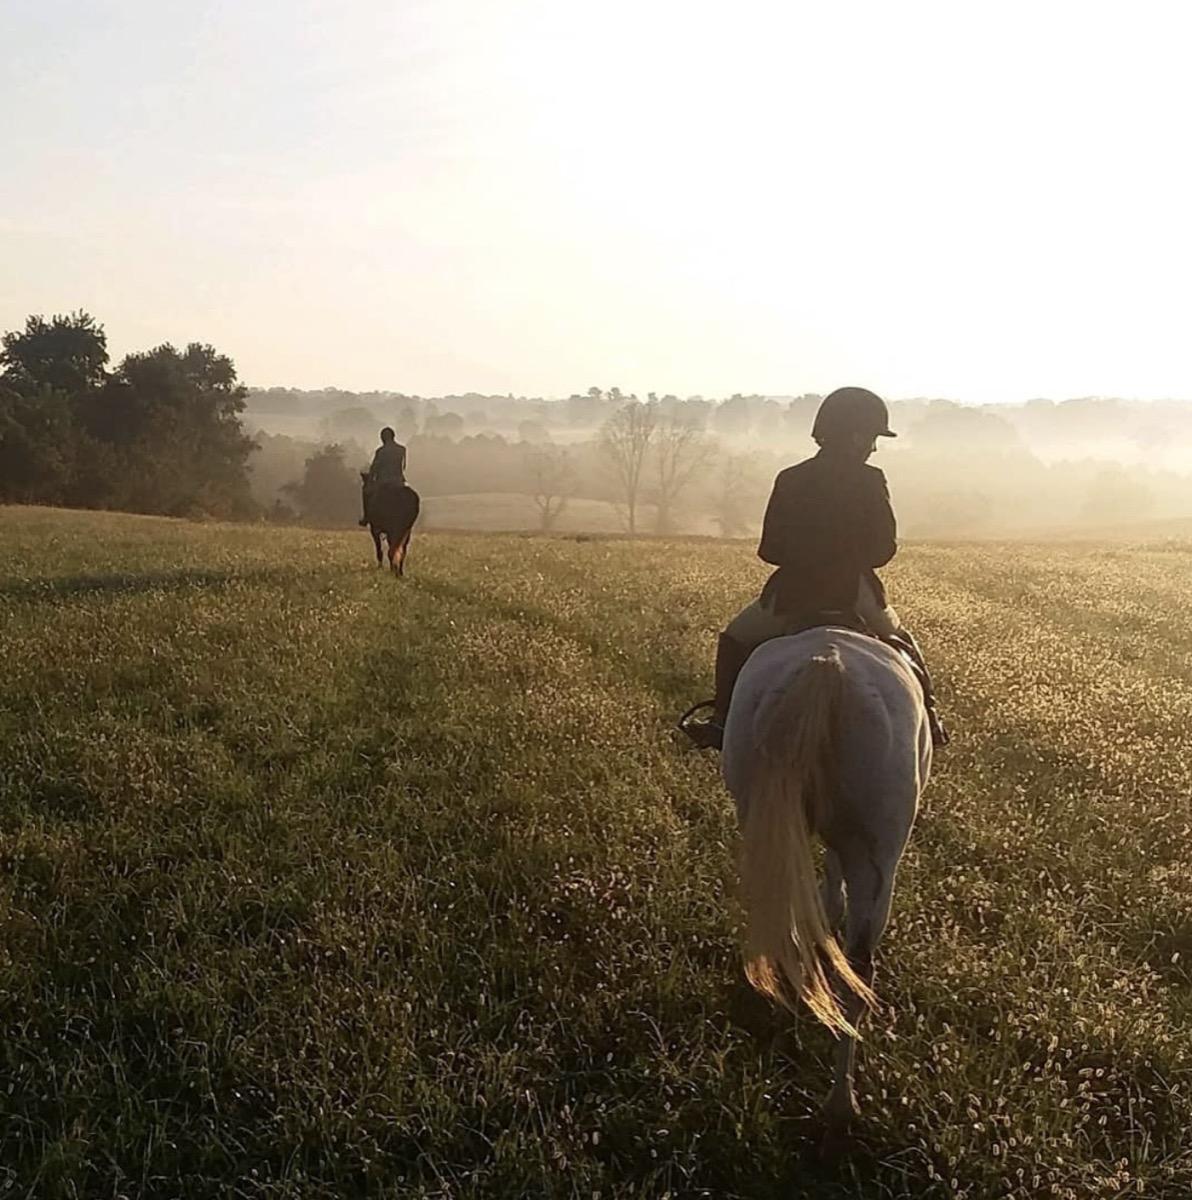 mackenzie rosman on horseback riding across a field